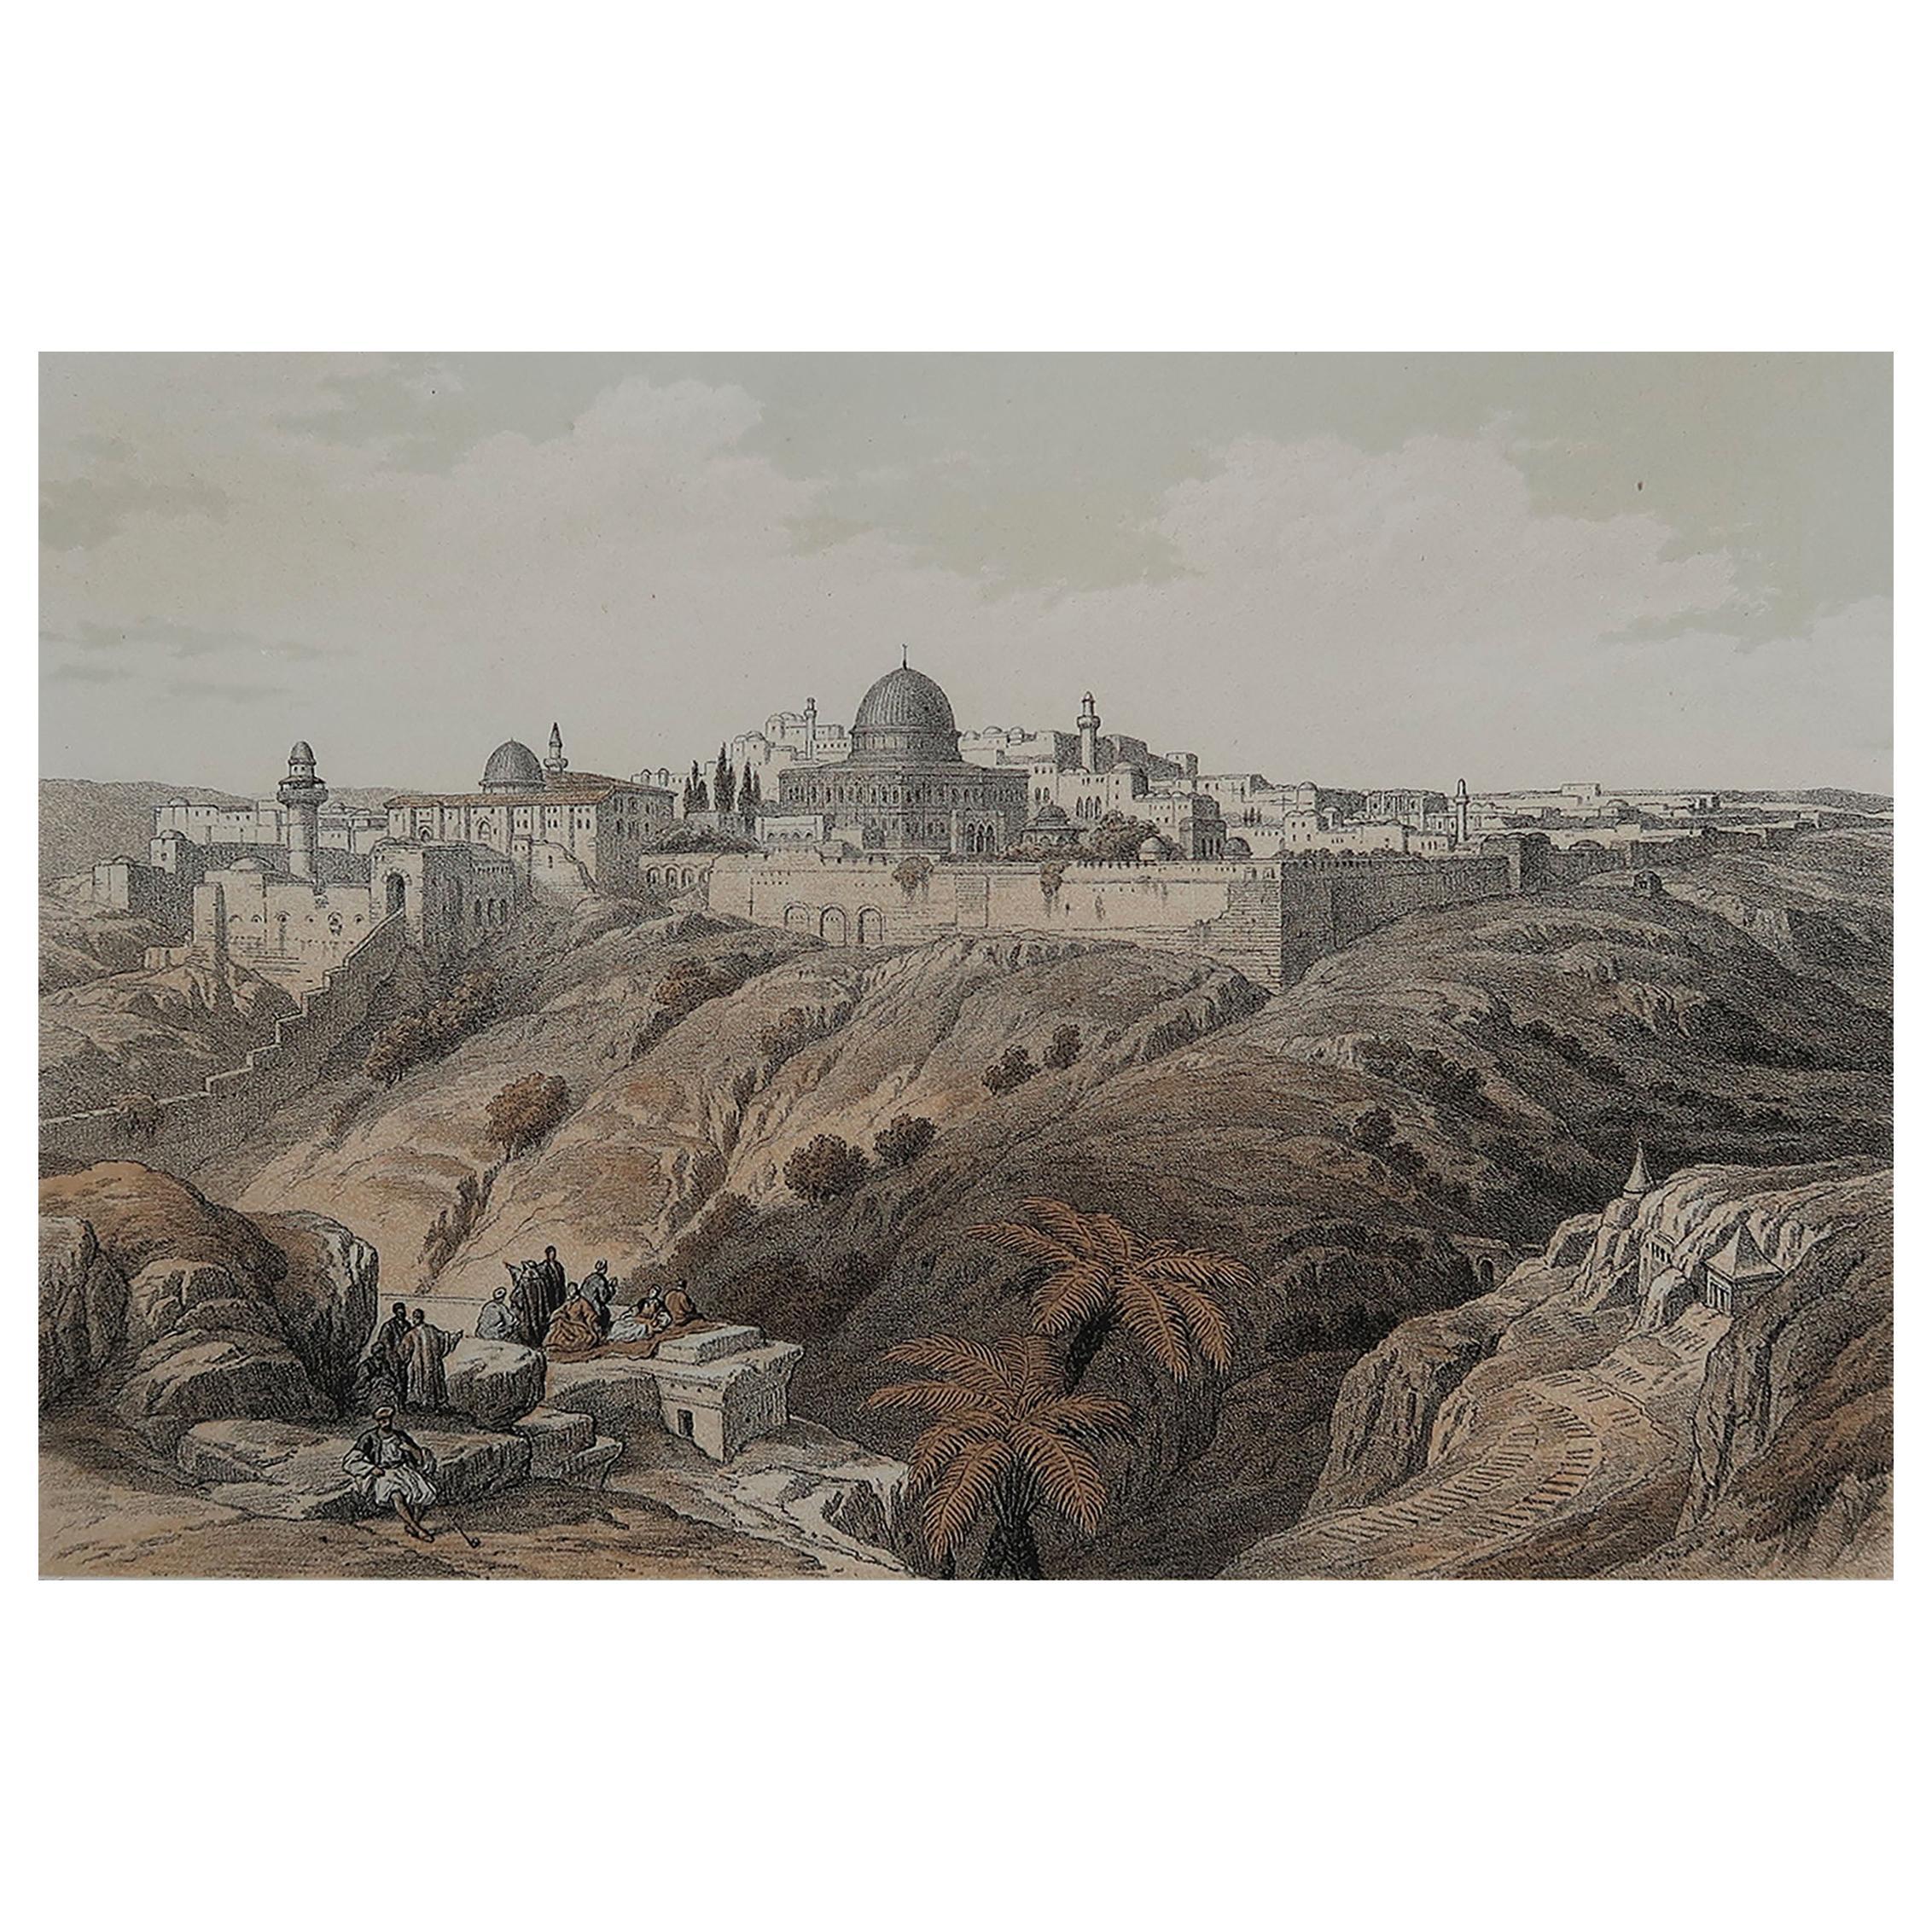 Original Antique Print of Jerusalem After David Roberts, C.1880